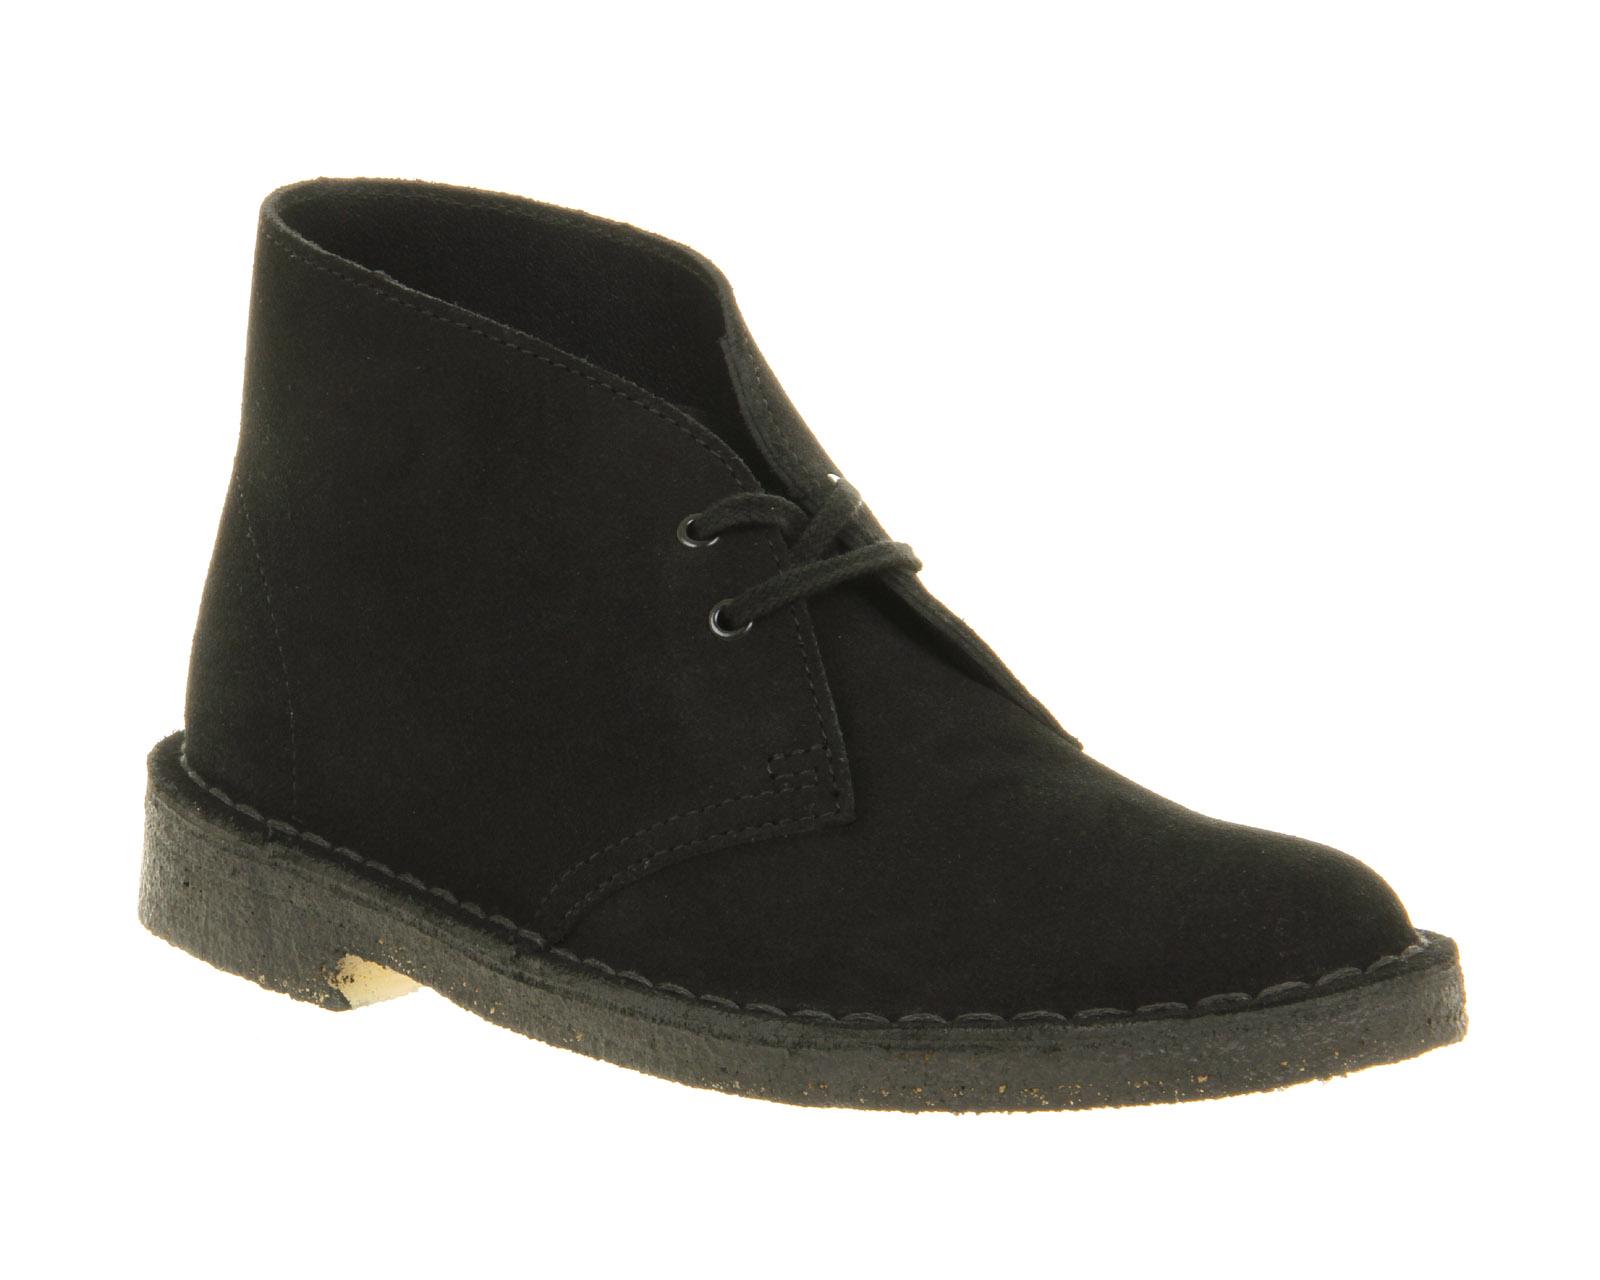 Clarks Daim Desert Boots En Noir - Noir 7wNHYse